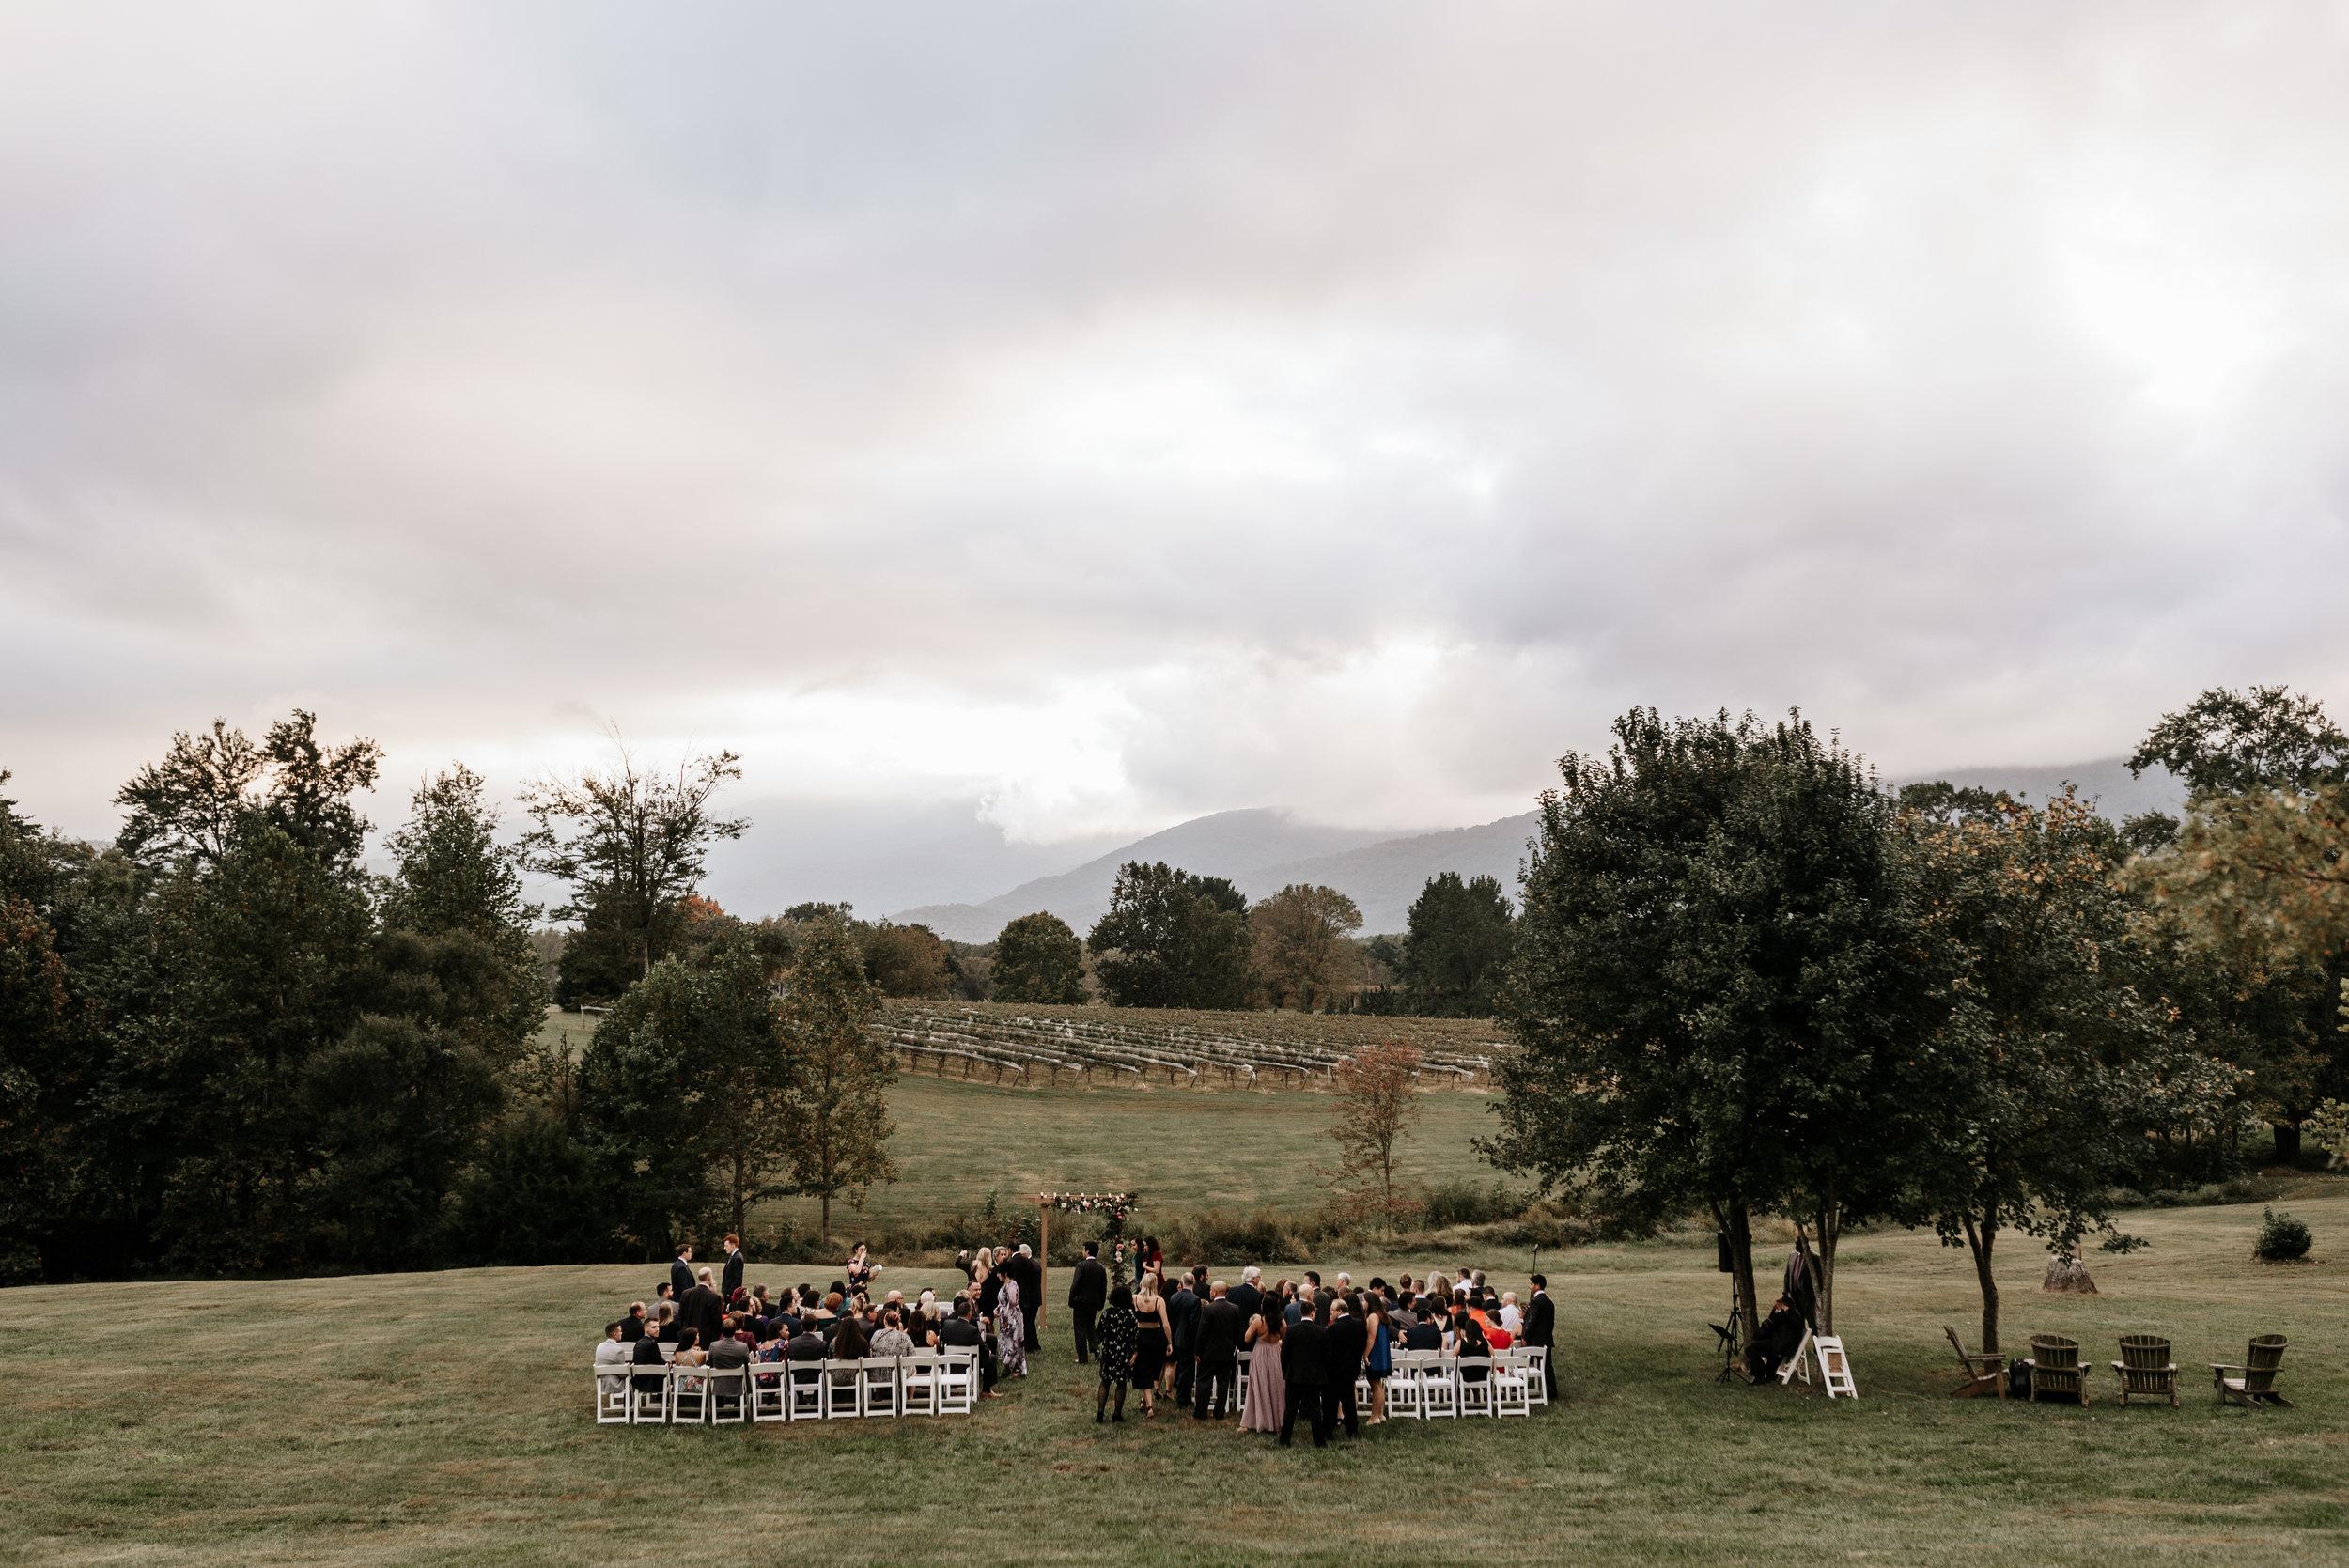 Veritas-Vineyards-and-Winery-Wedding-Photography-Afton-Virginia-Yasmin-Seth-Photography-by-V-9605.jpg